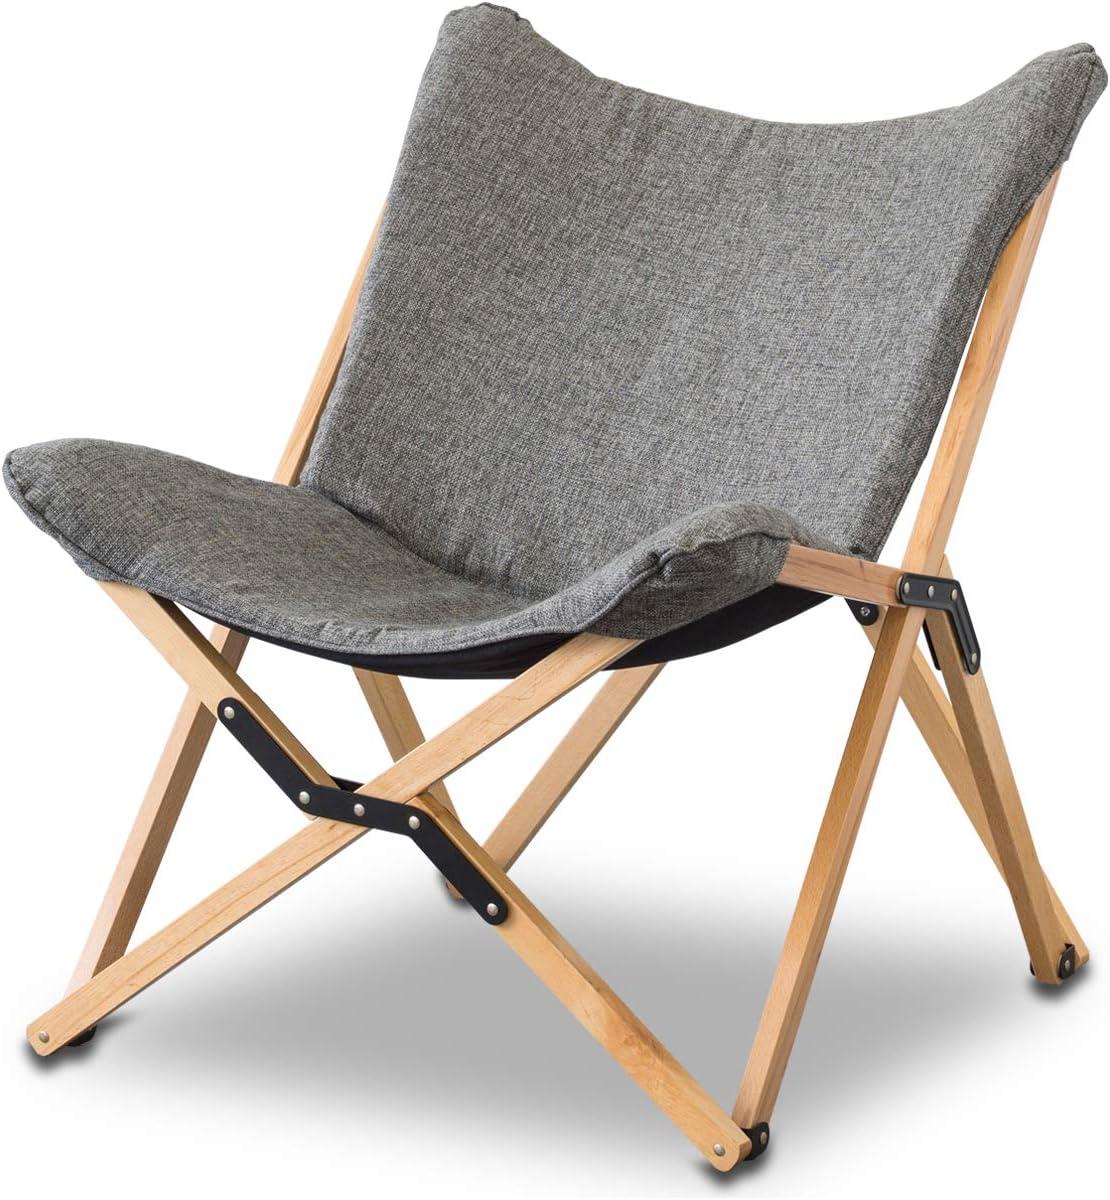 【FIELDOOR】木製折り畳み